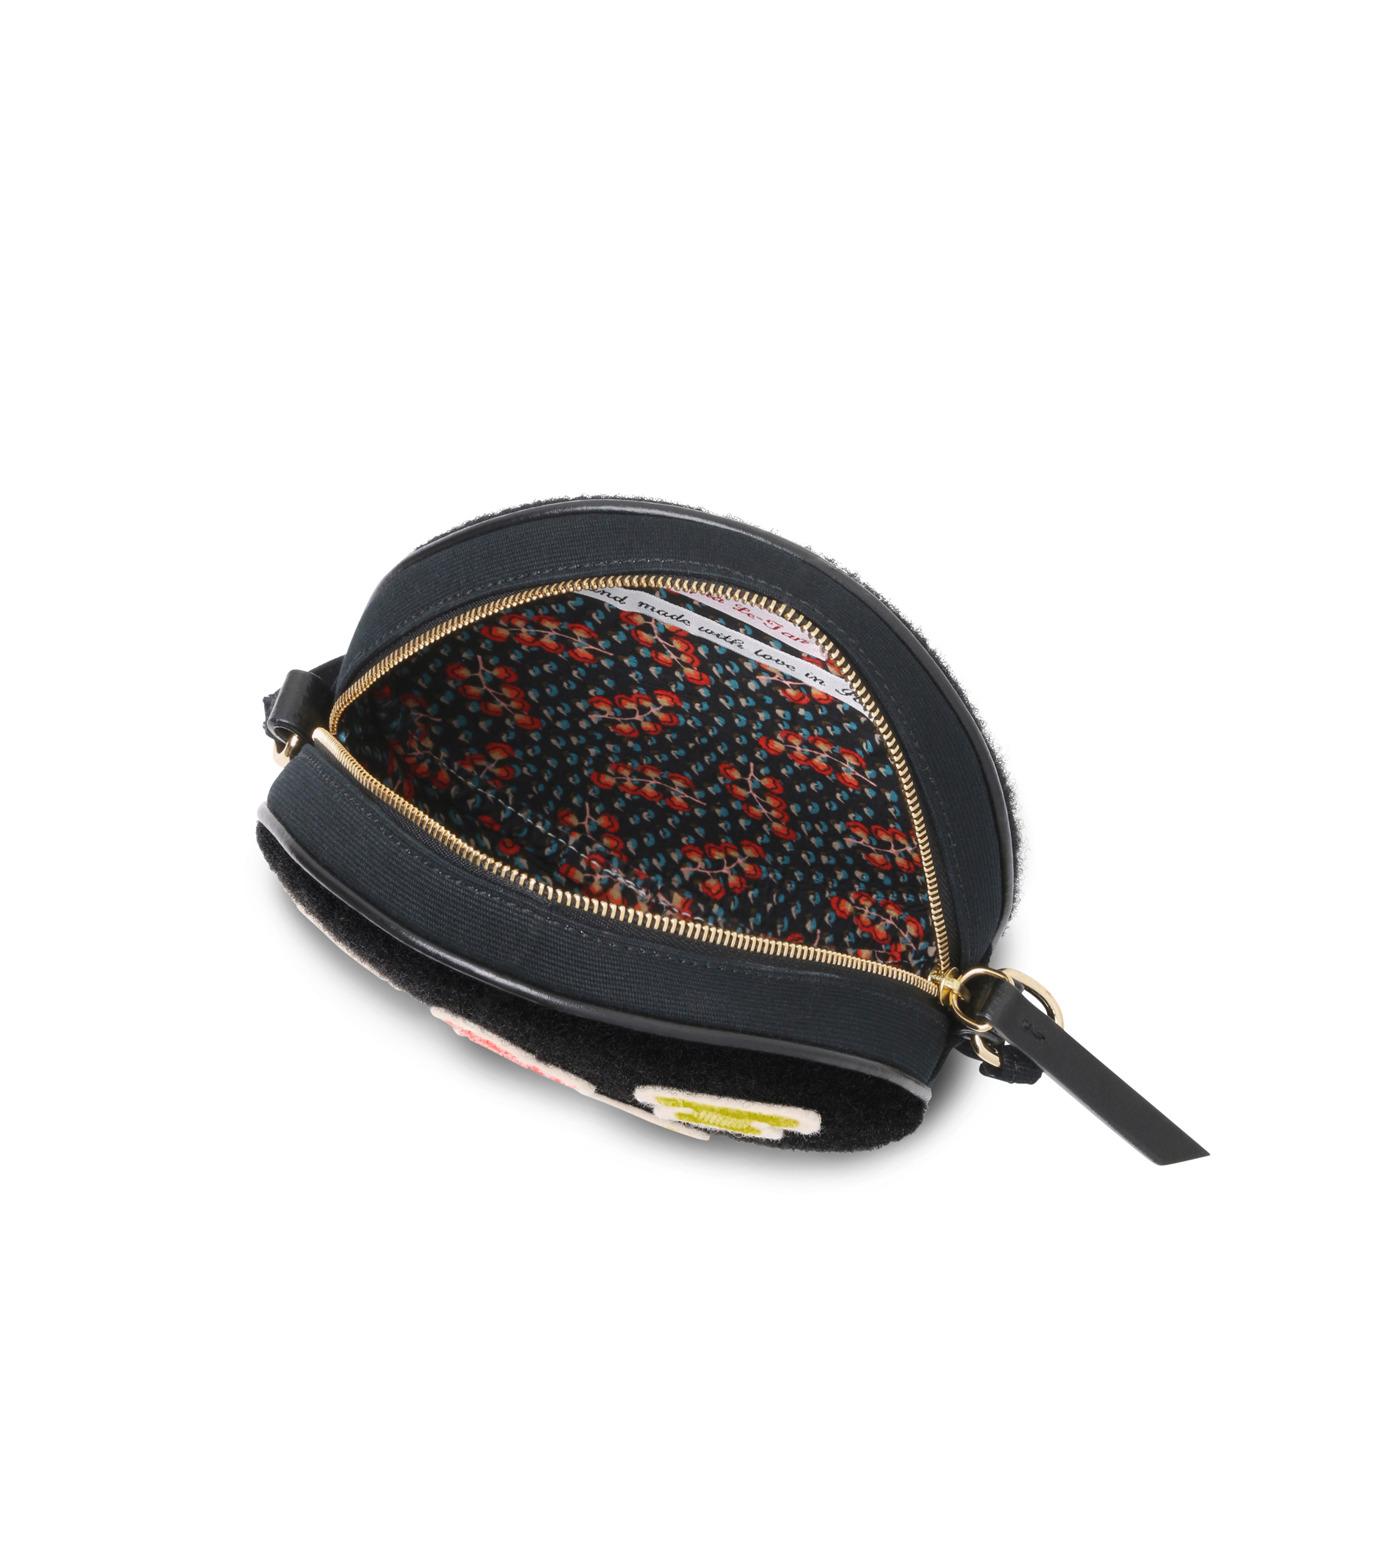 Olympia Le-Tan(オリンピア ルタン)のBlack Velcro Dizzie Bag-BLACK(ショルダーバッグ/shoulder bag)-FW16BDI008-13 拡大詳細画像4